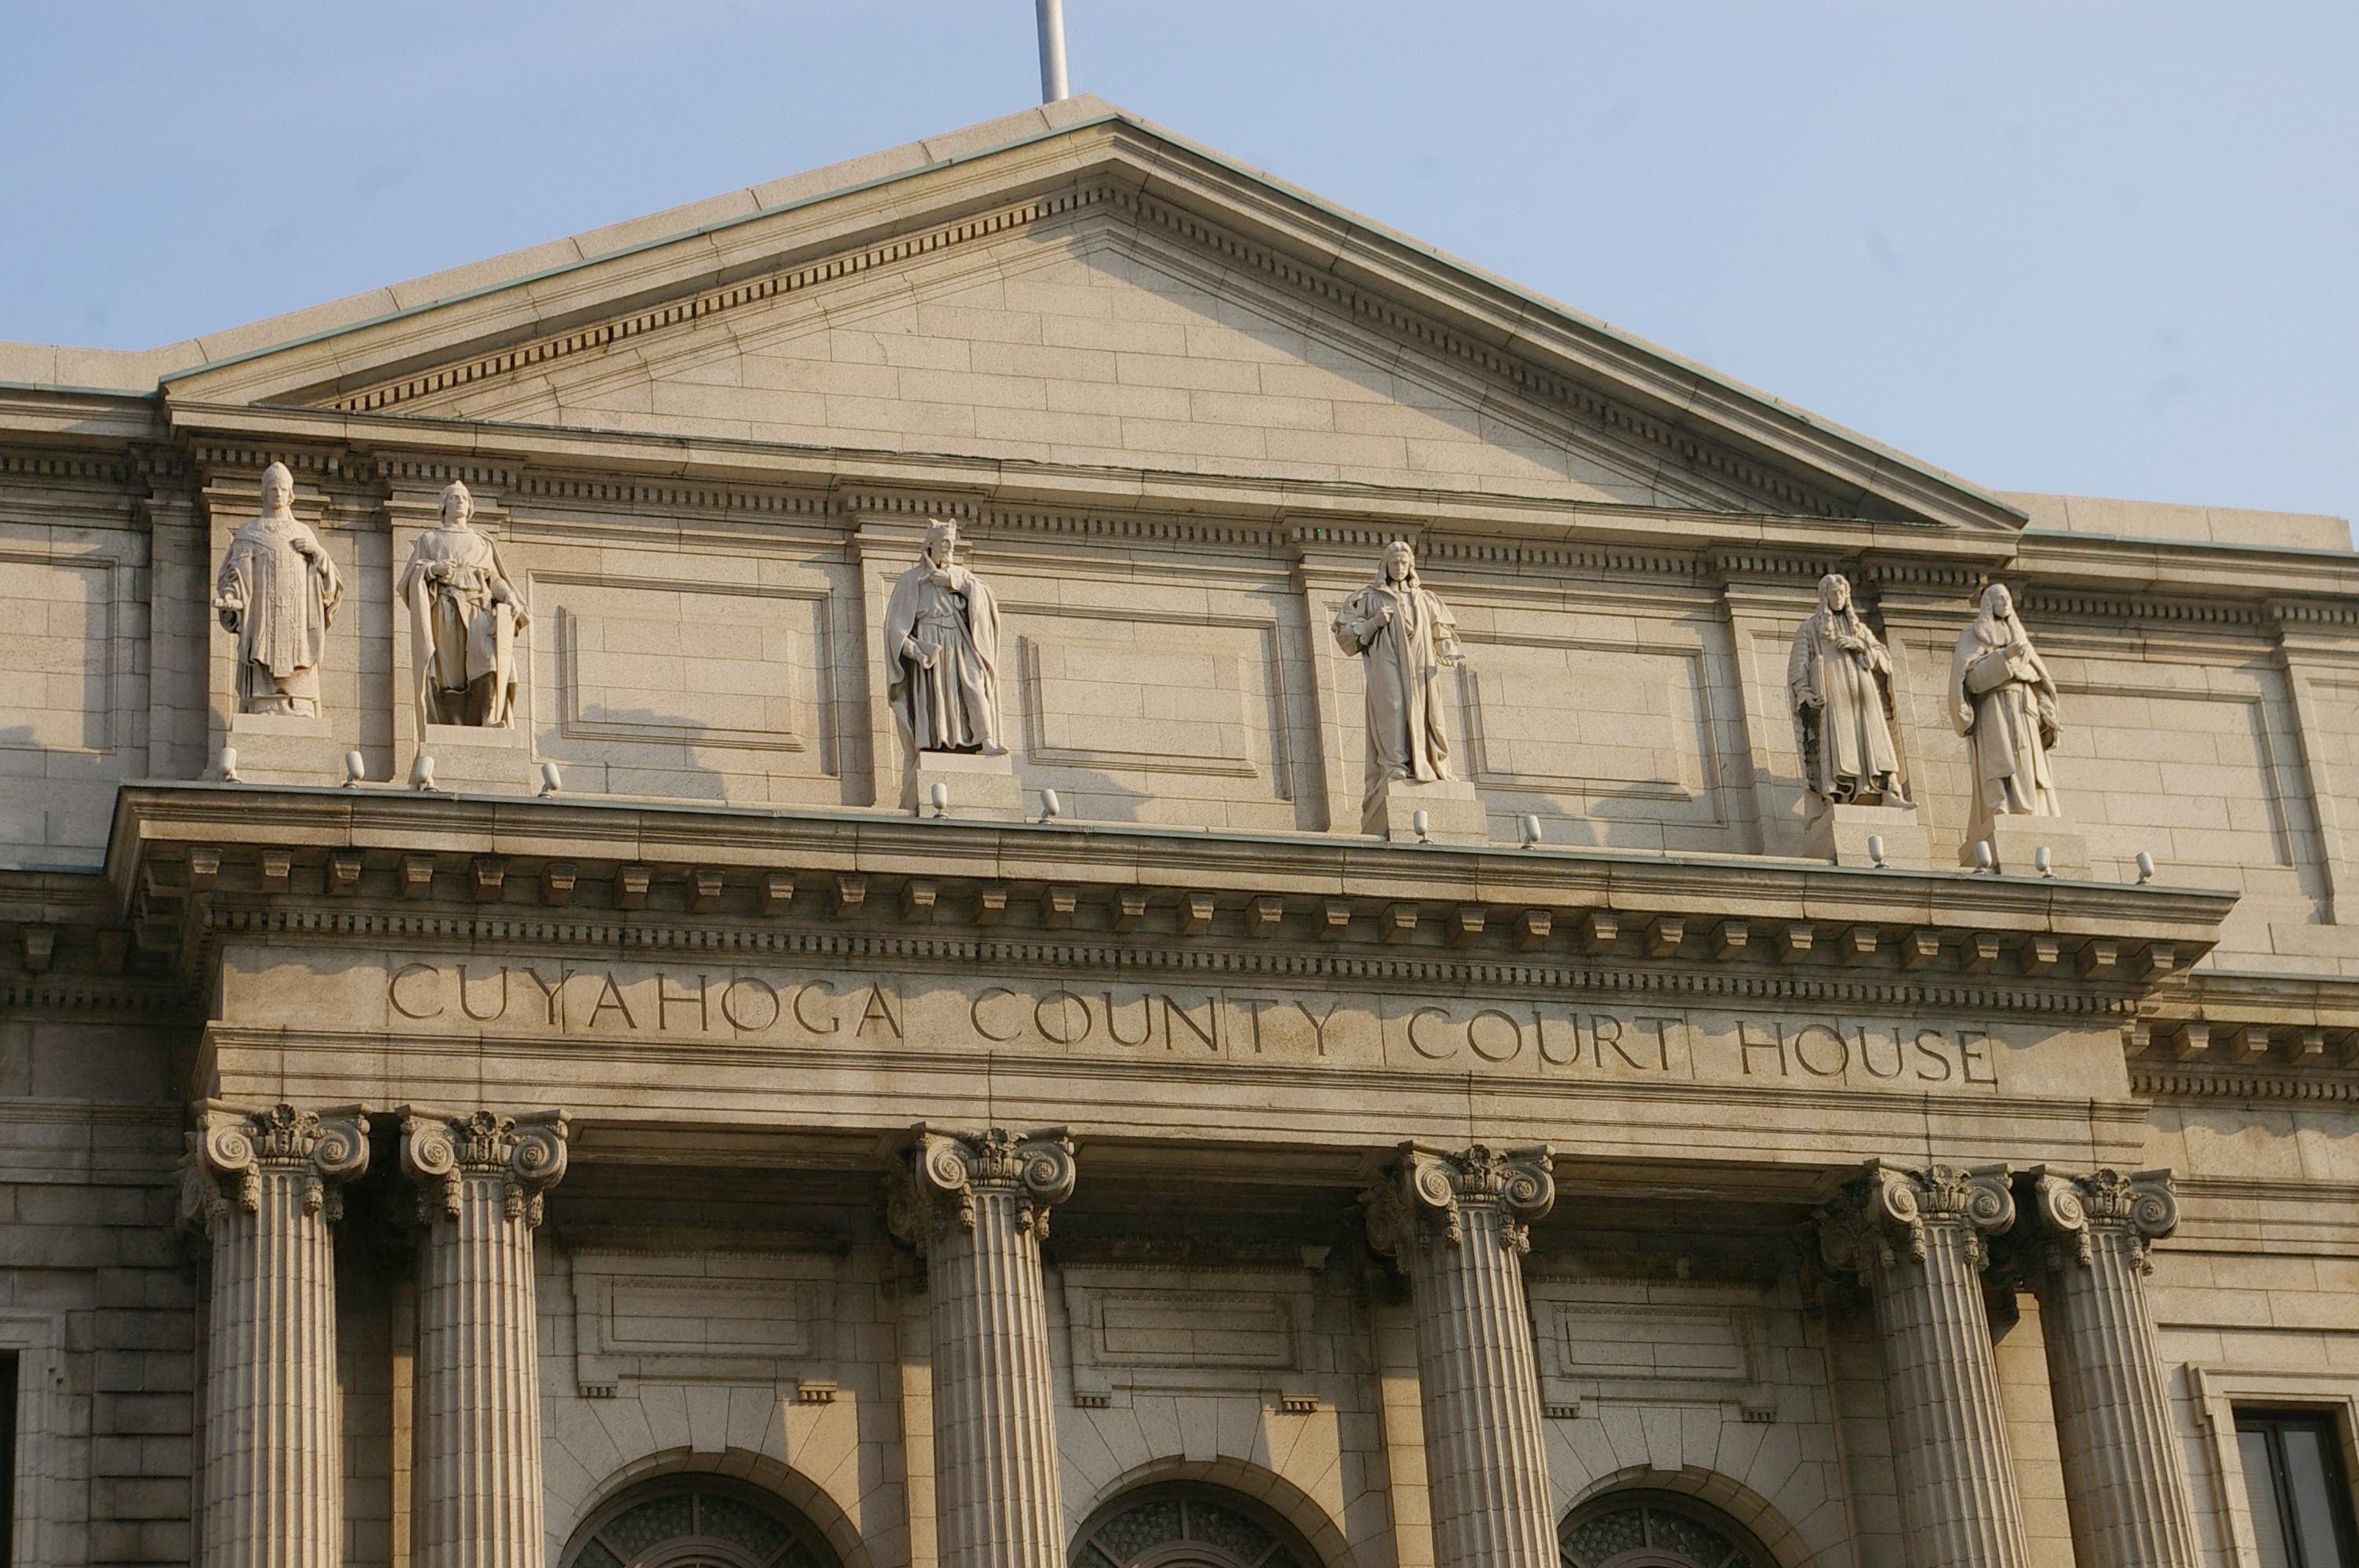 Cuyahoga County Us Courthouses